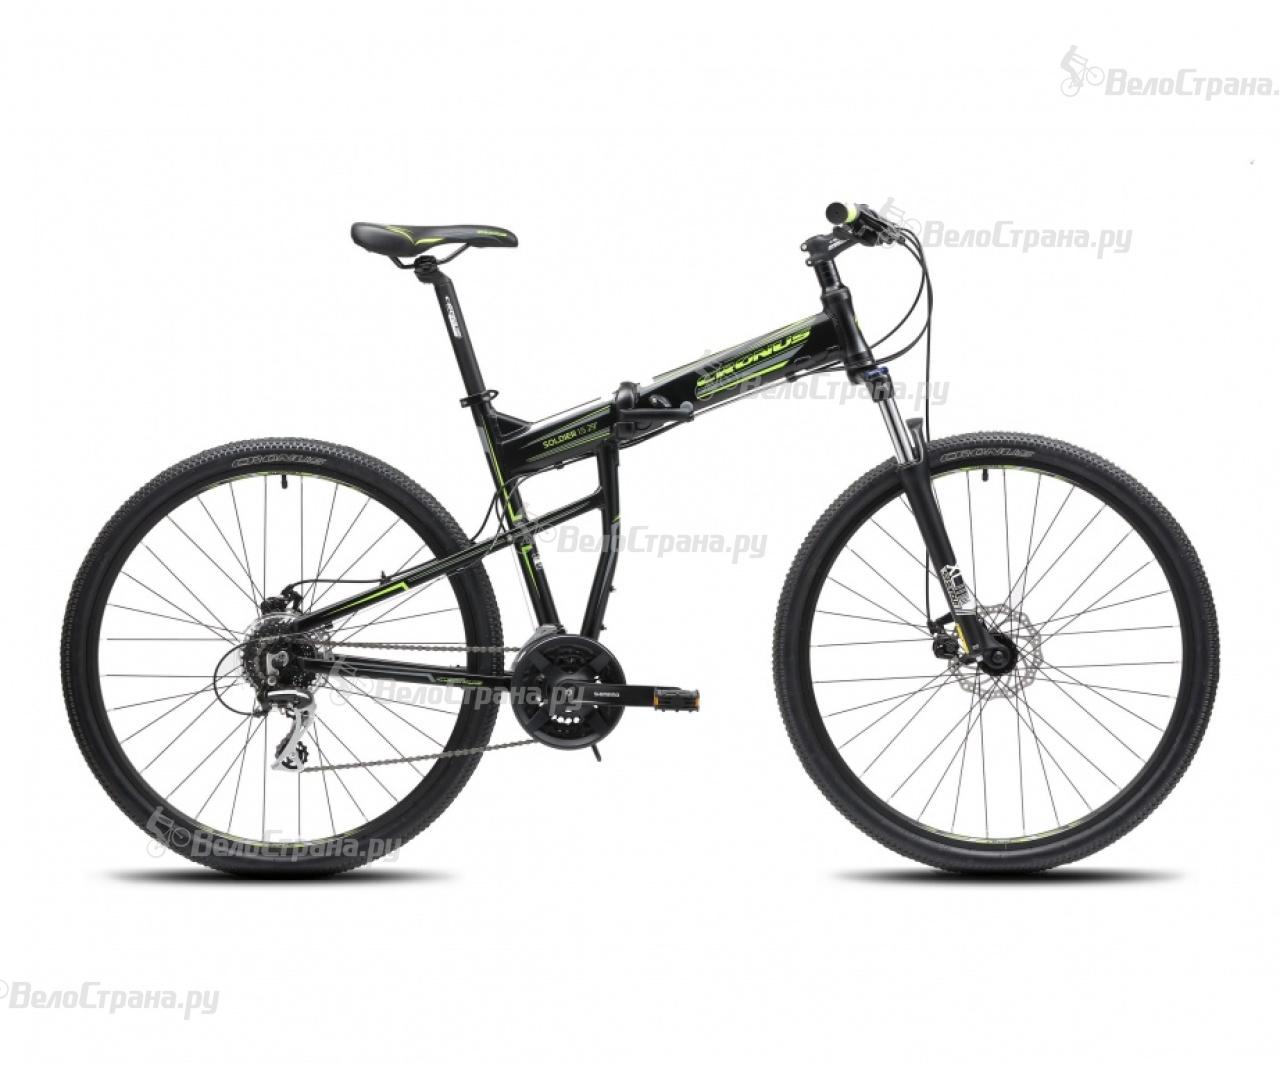 Велосипед Cronus Soldier 1.5 29er (2017) велосипед cronus soldier 1 5 2014